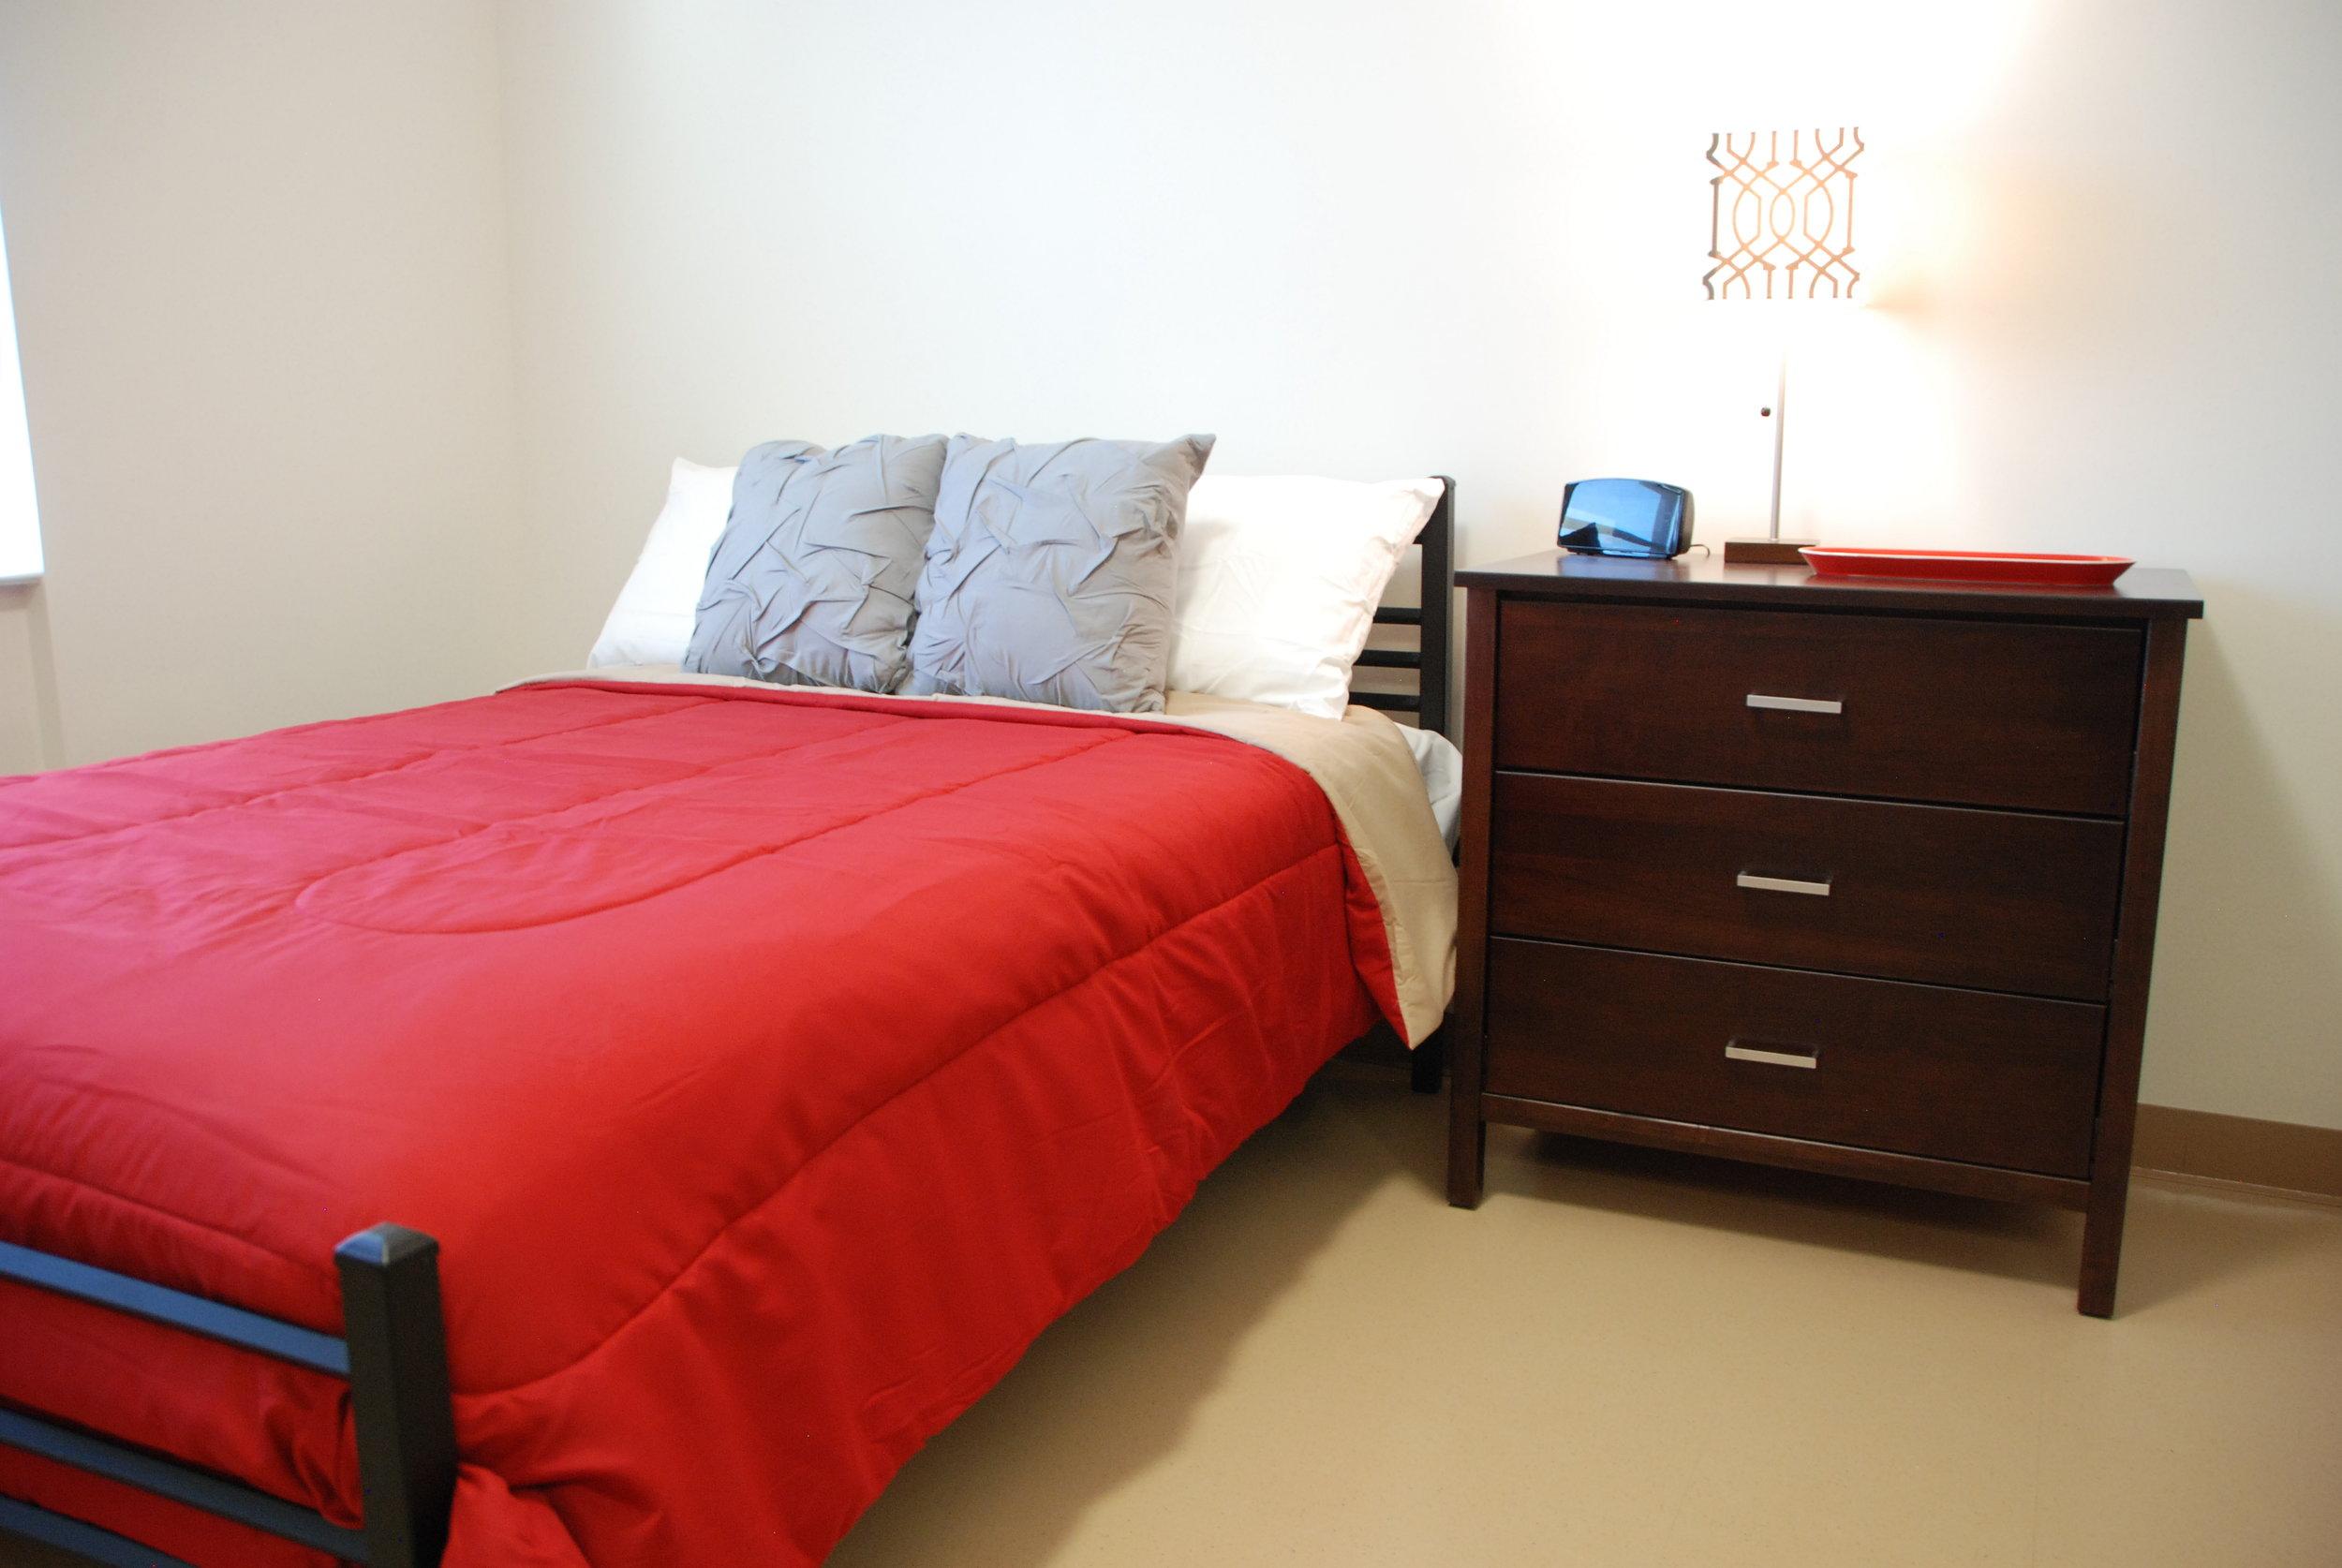 Transitional Living Bed.JPG